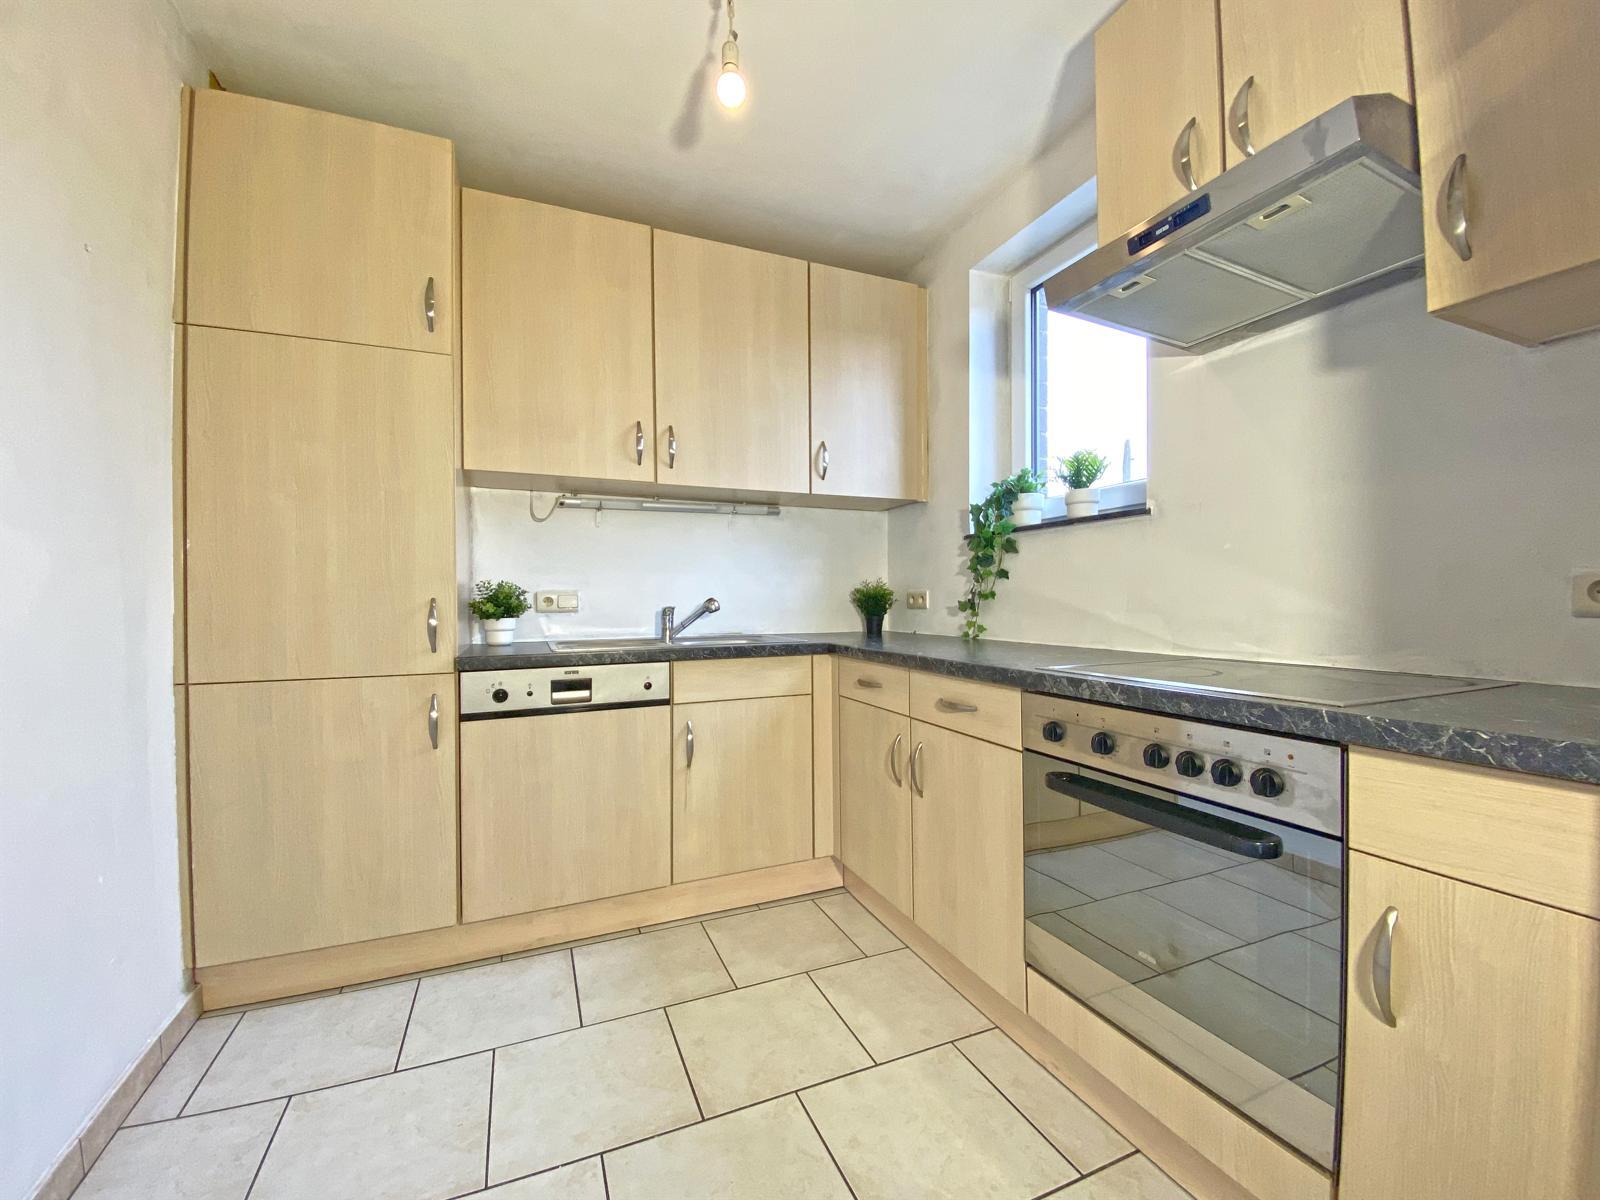 Appartement - Libramont-Chevigny - #4501598-4